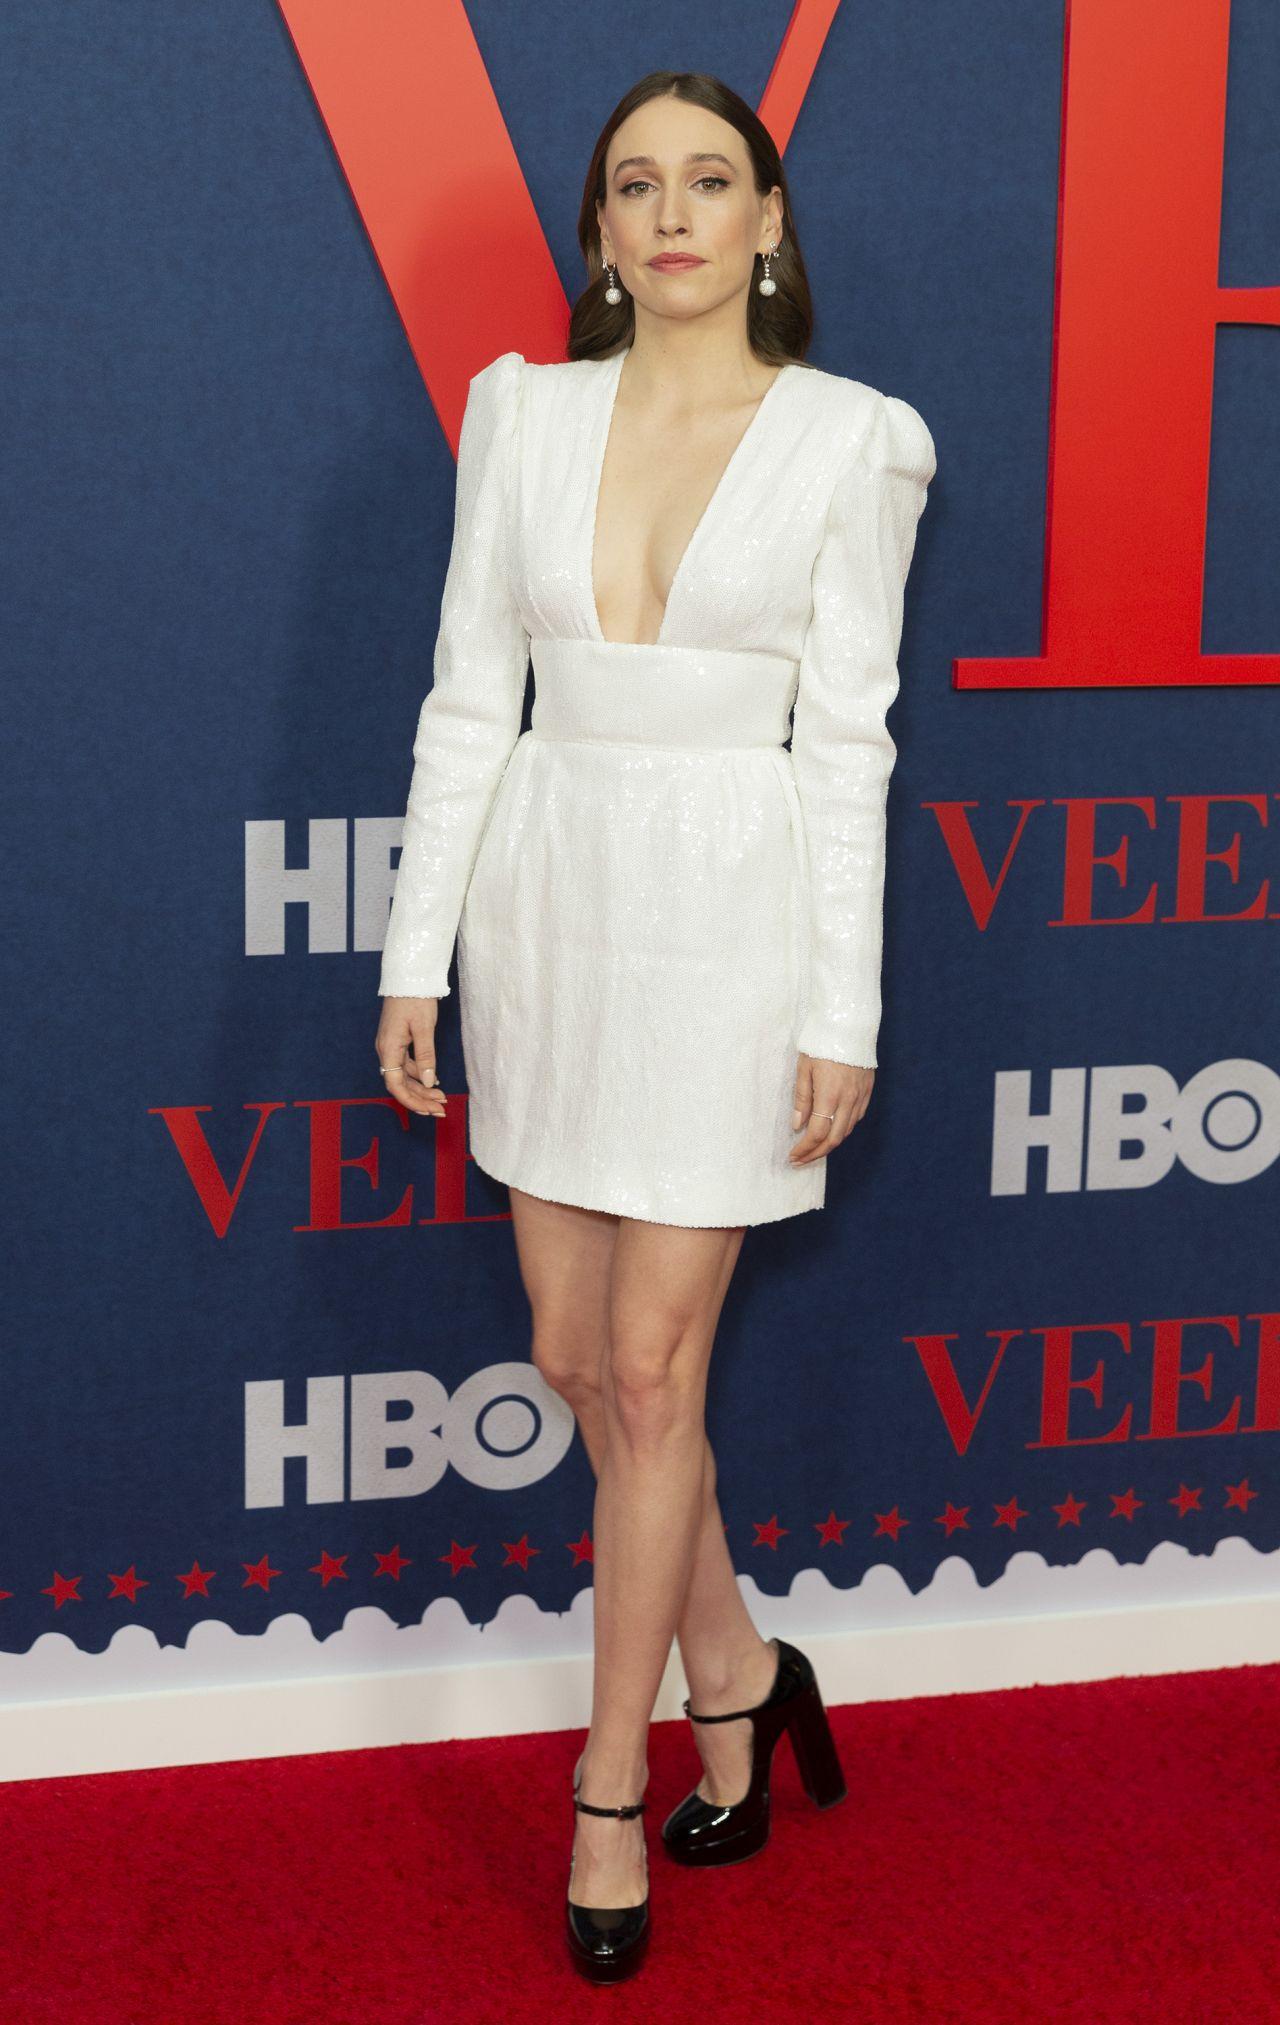 Sarah Sutherland Veep Season 7 Premiere In Nyc